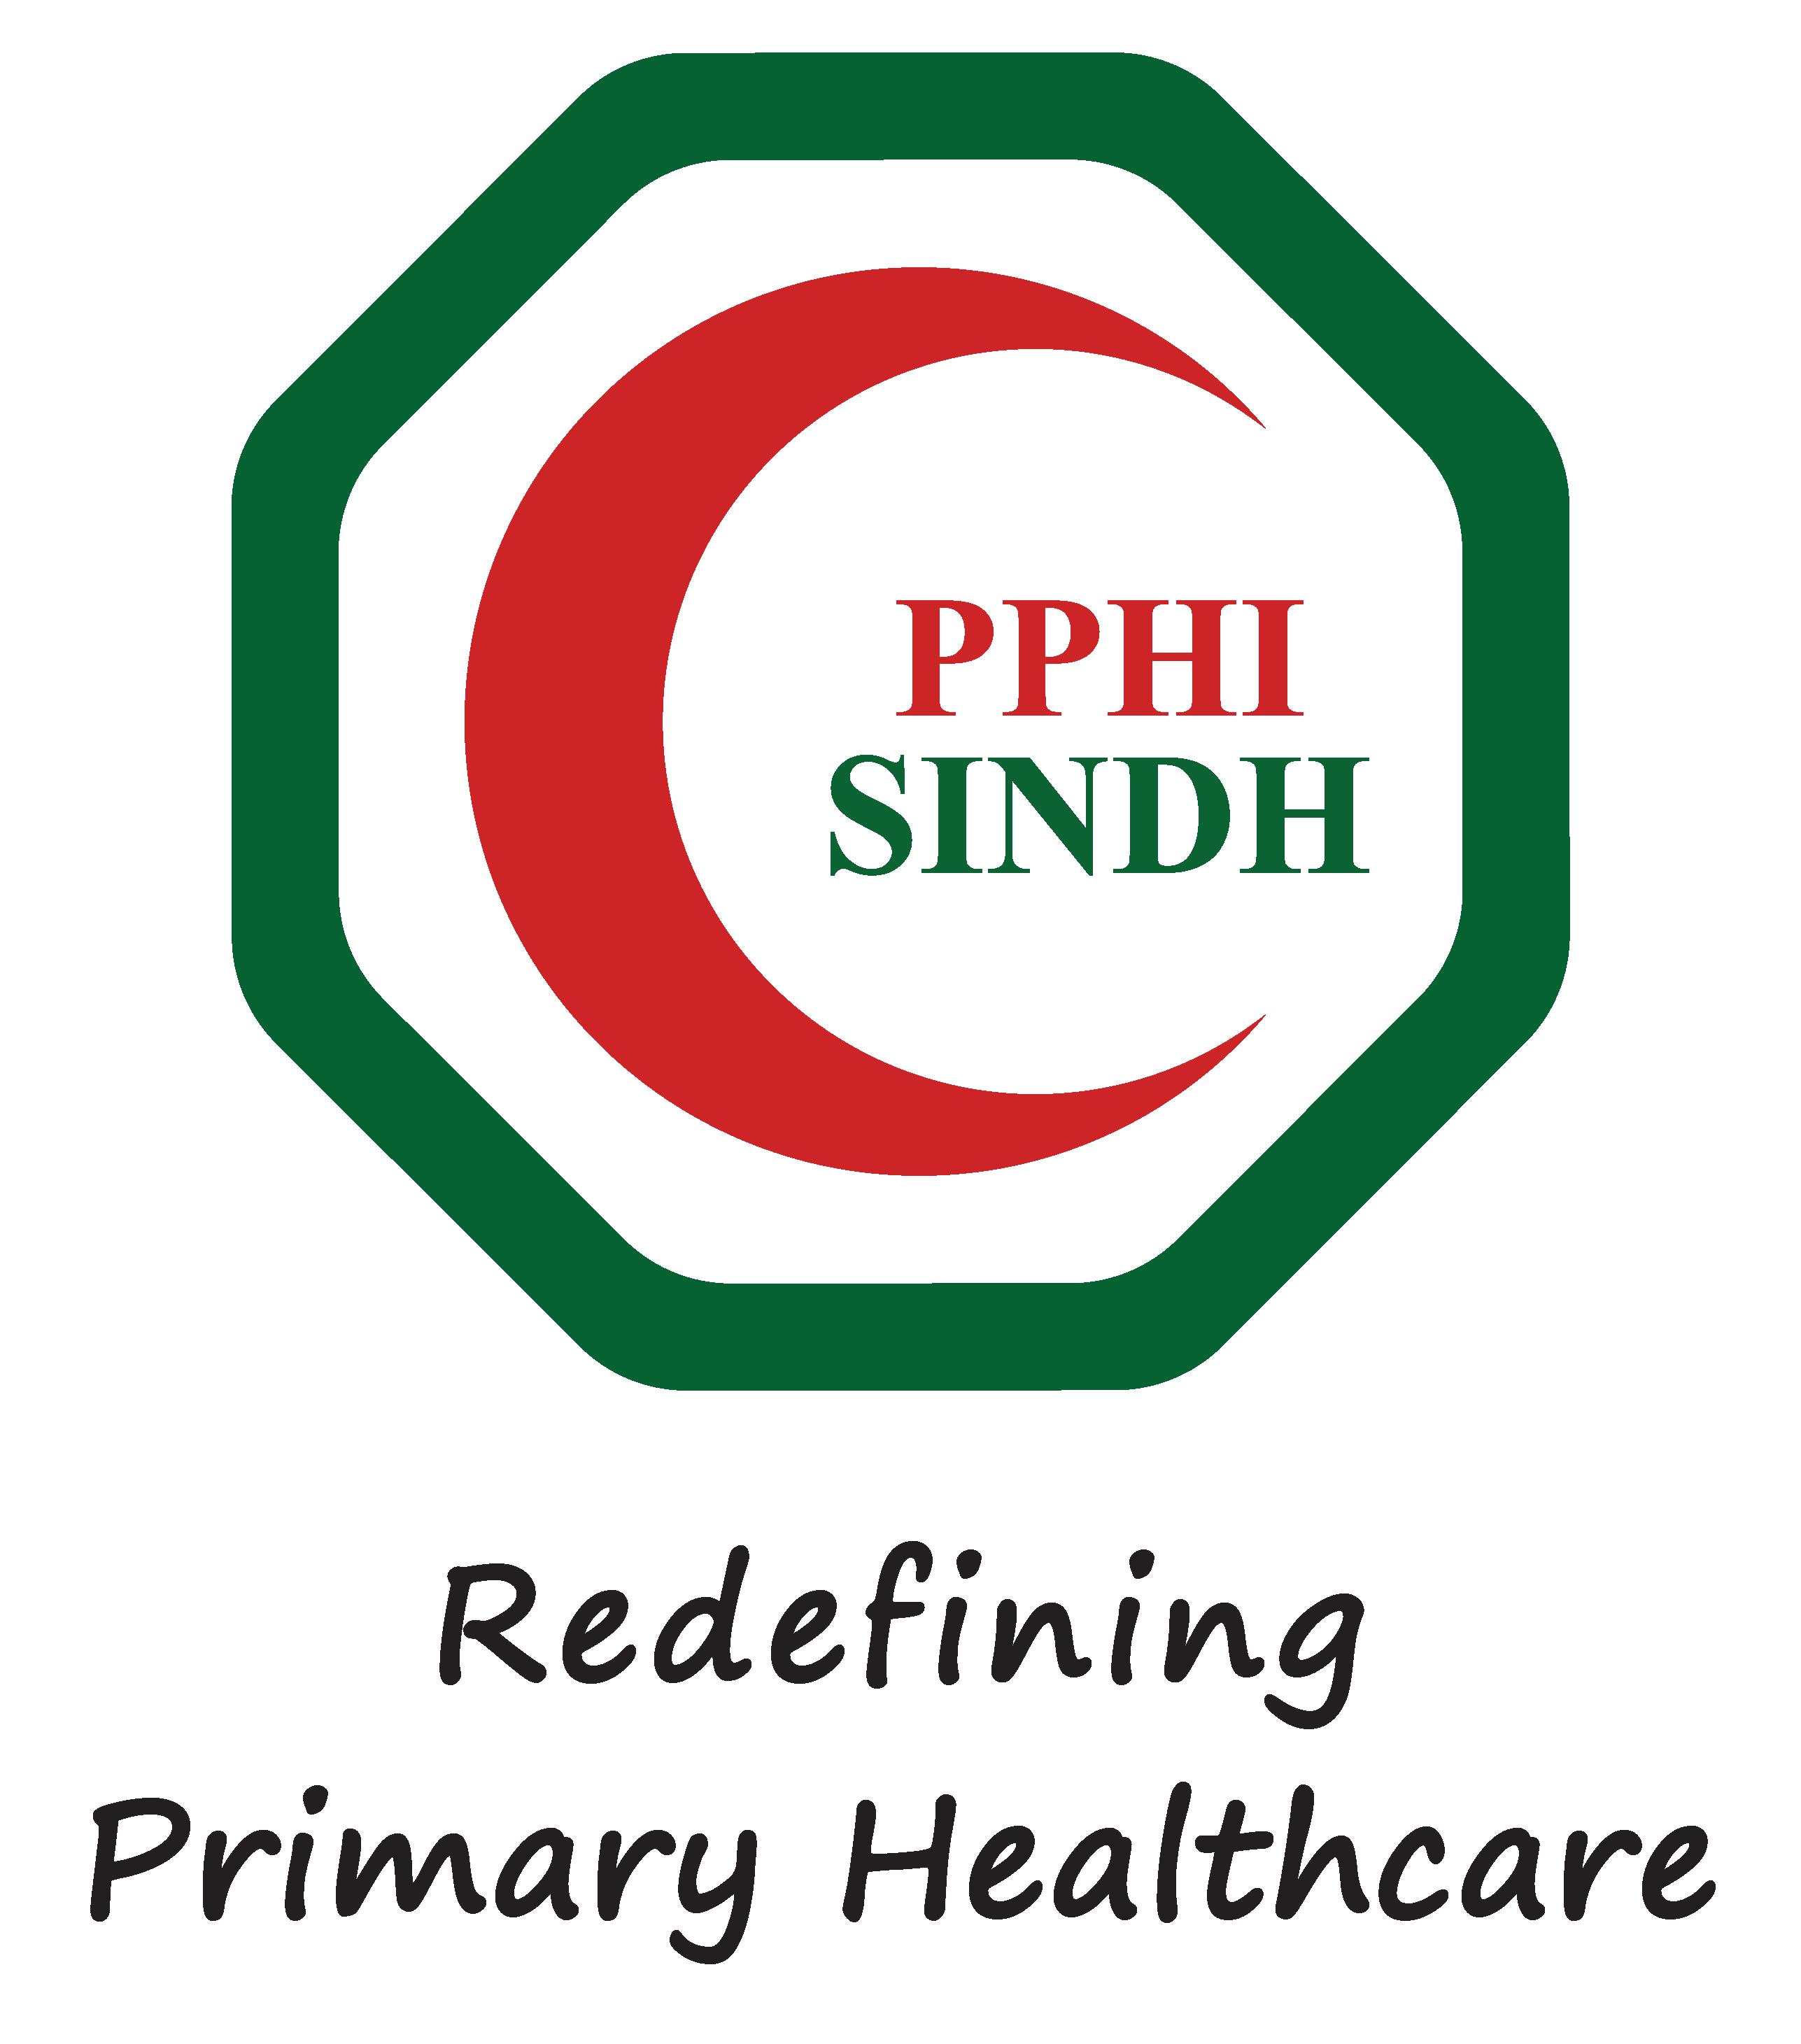 PPHI SINDH - Karachi